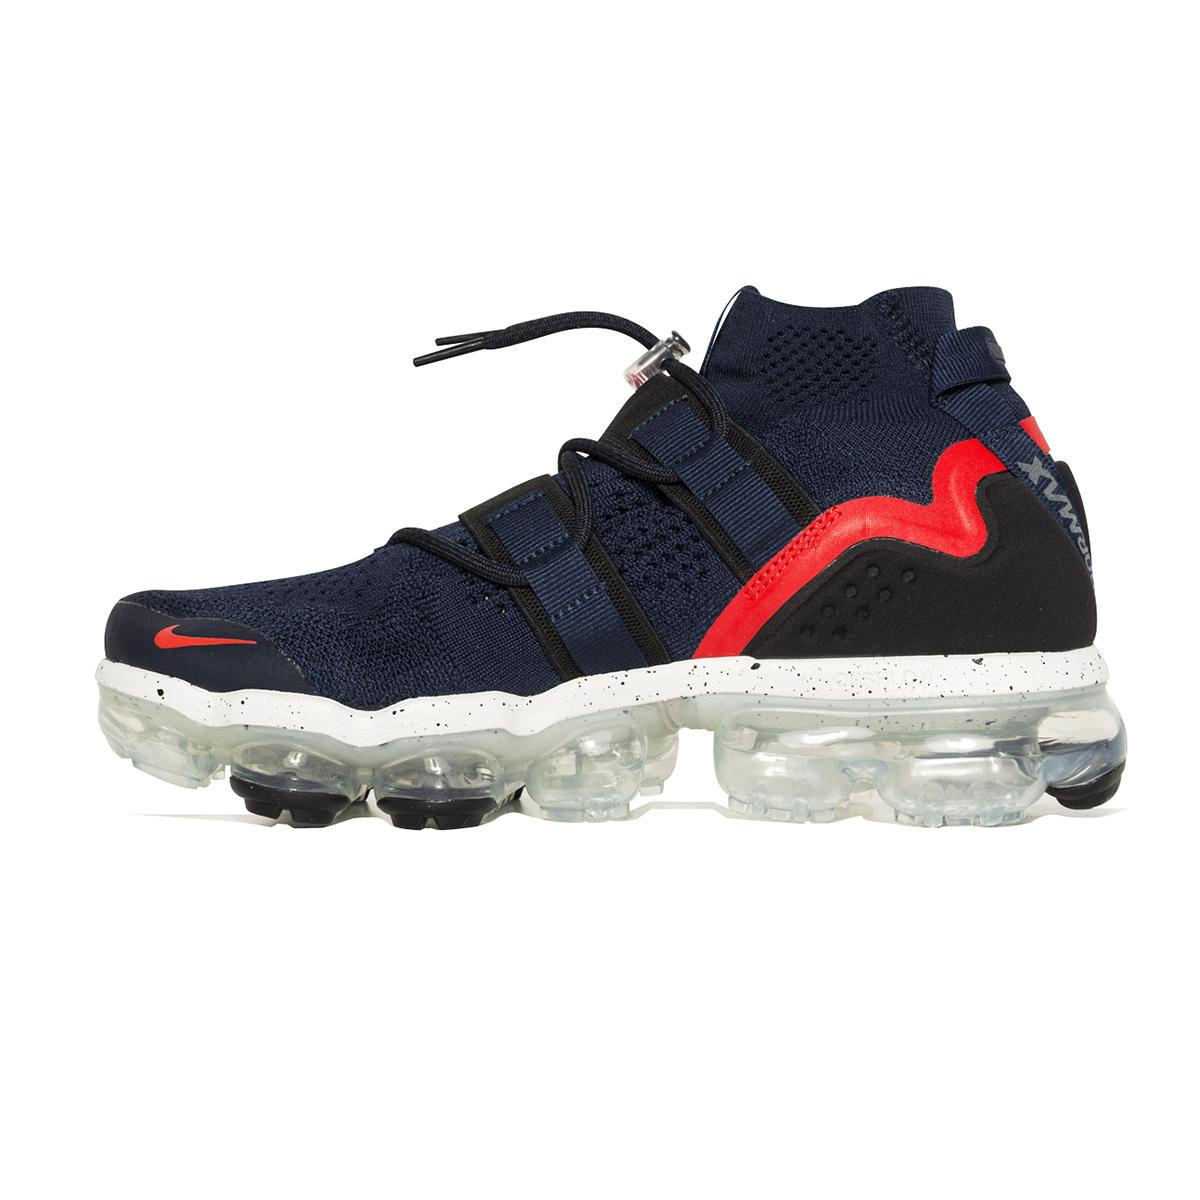 e3963fb4966 ... Nike Air Vapormax Flyknit Utility (Navy  Black  Red) Men 7-13 ...